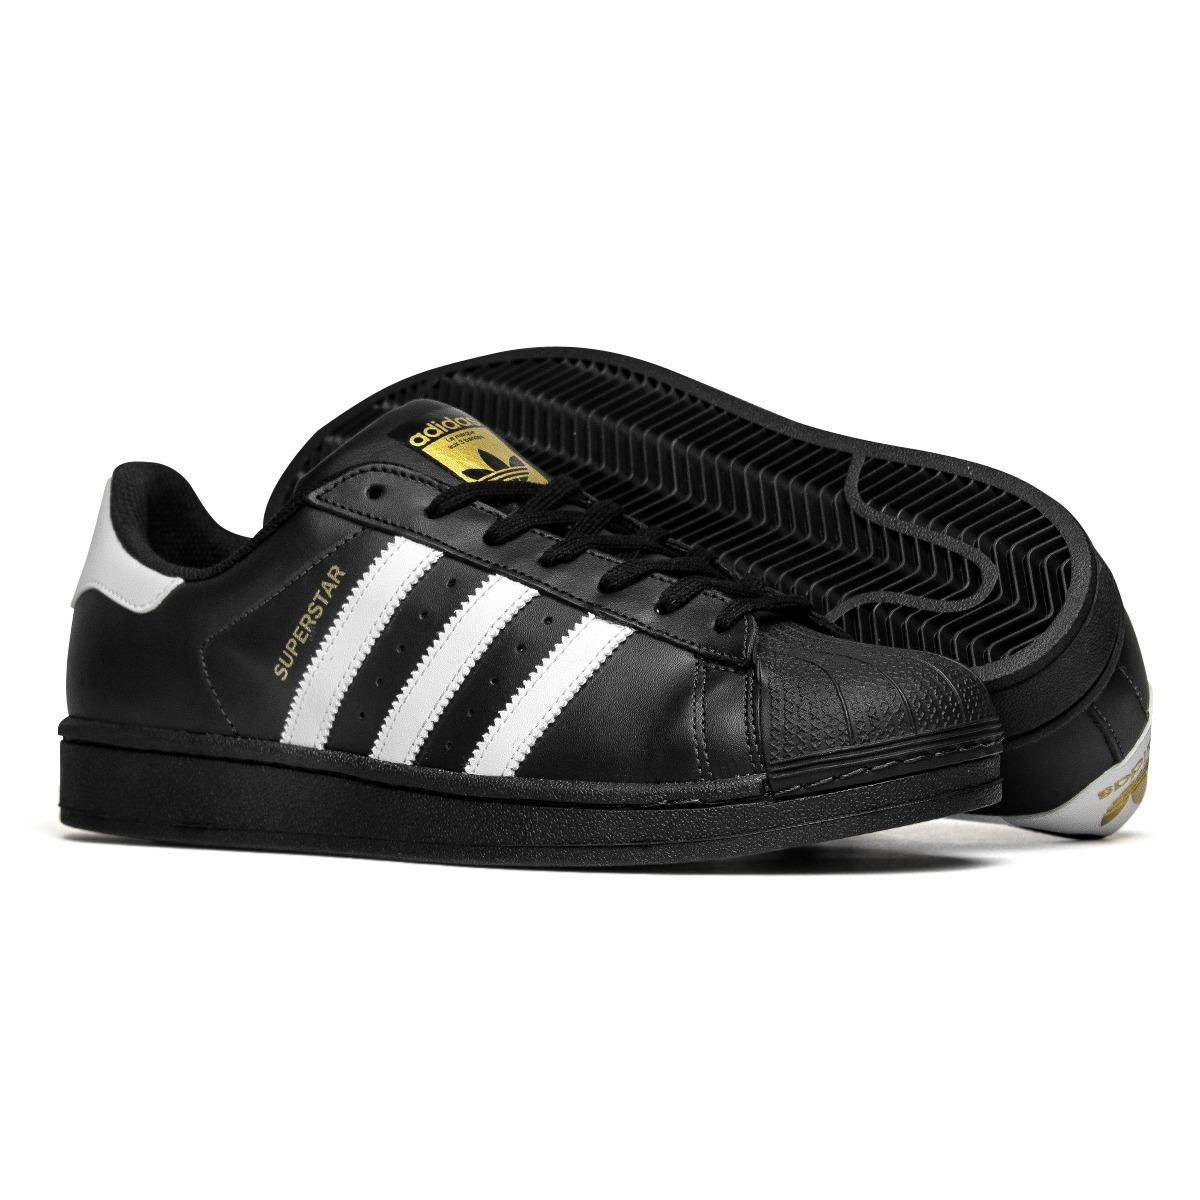 d722dc89f8 tênis adidas superstar originals unissex black friday. Carregando zoom.